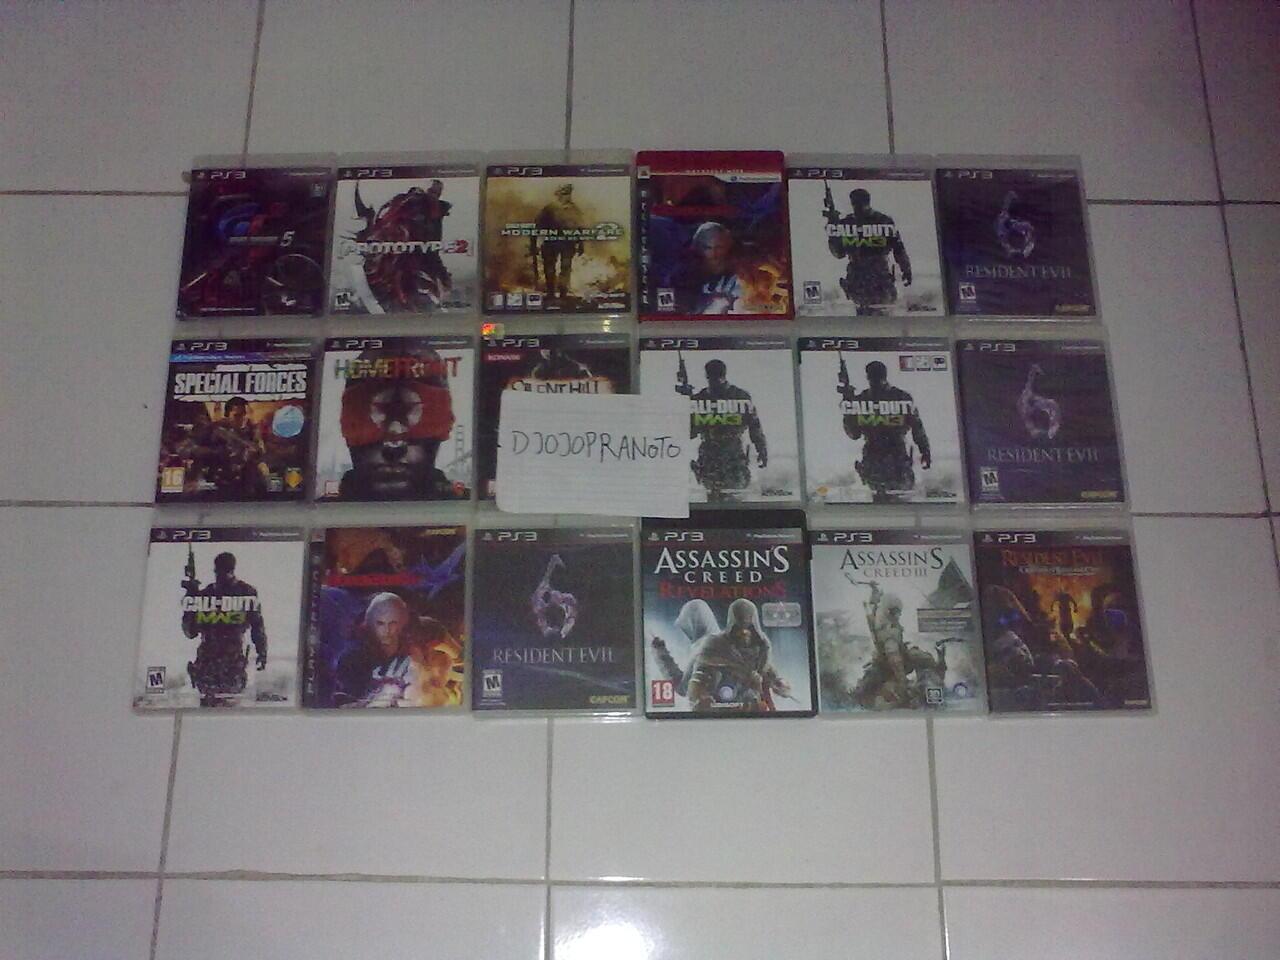 PS3 DMC 4,MW 2,3,Socom 4,Homefront,Sillenthill,Asasin Creed,R.Evil,Prototype 2,GT5